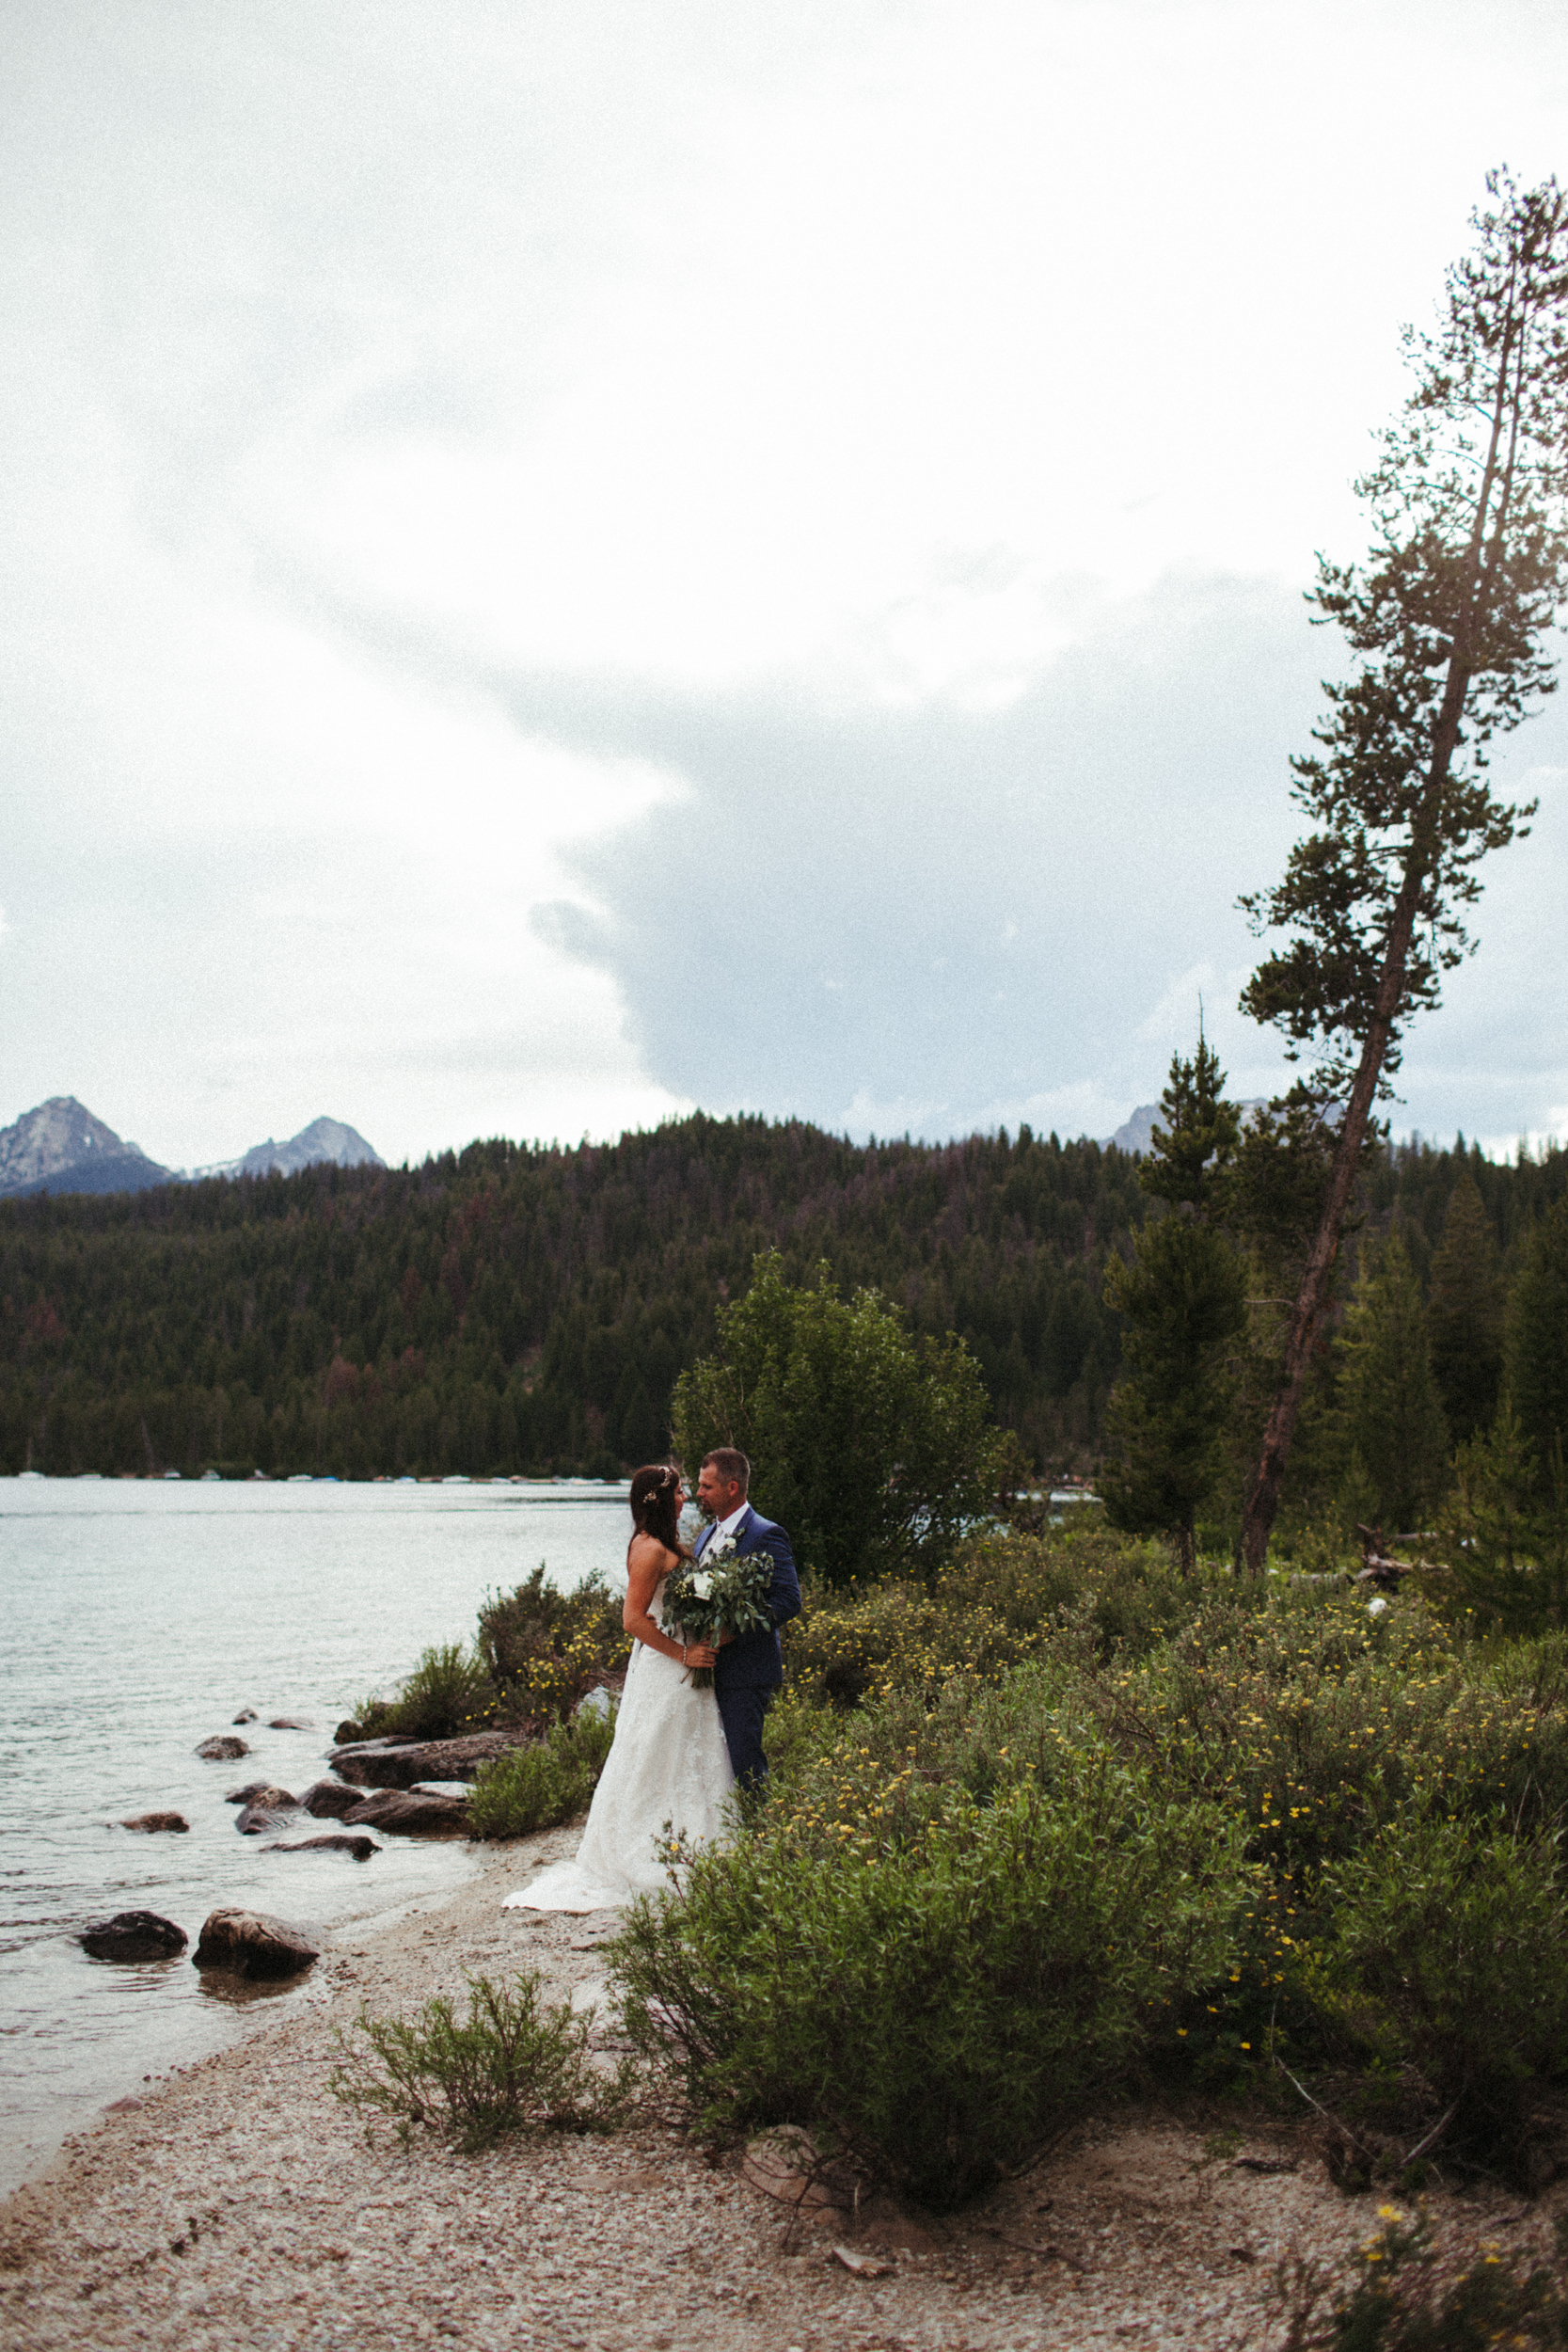 Jerica + Von | Redfish Lake Elopement